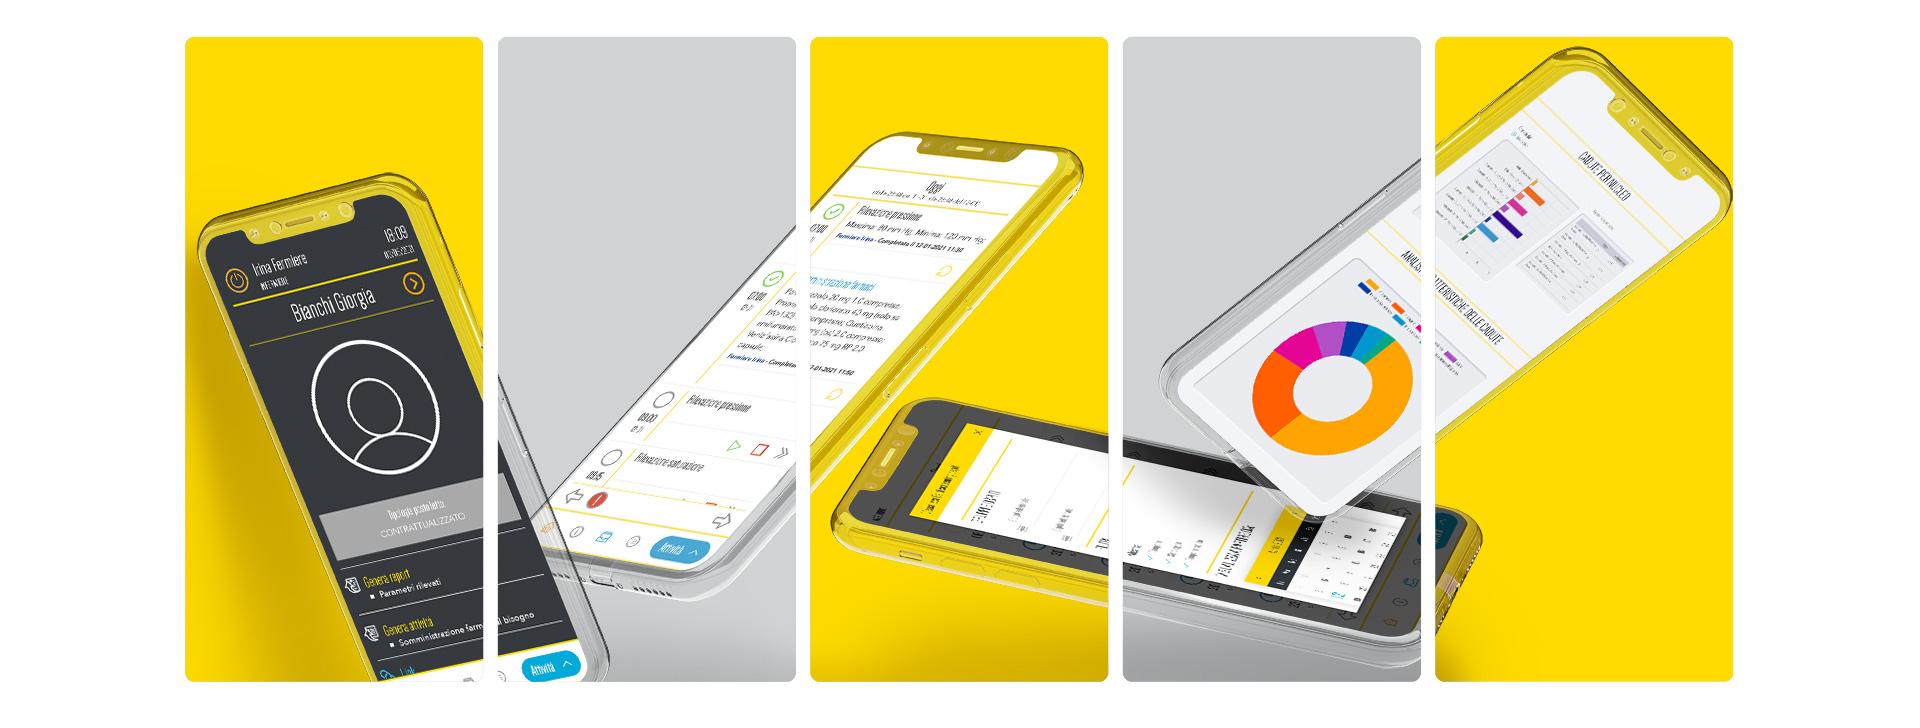 App-Store-Screenshots-Template-vol3